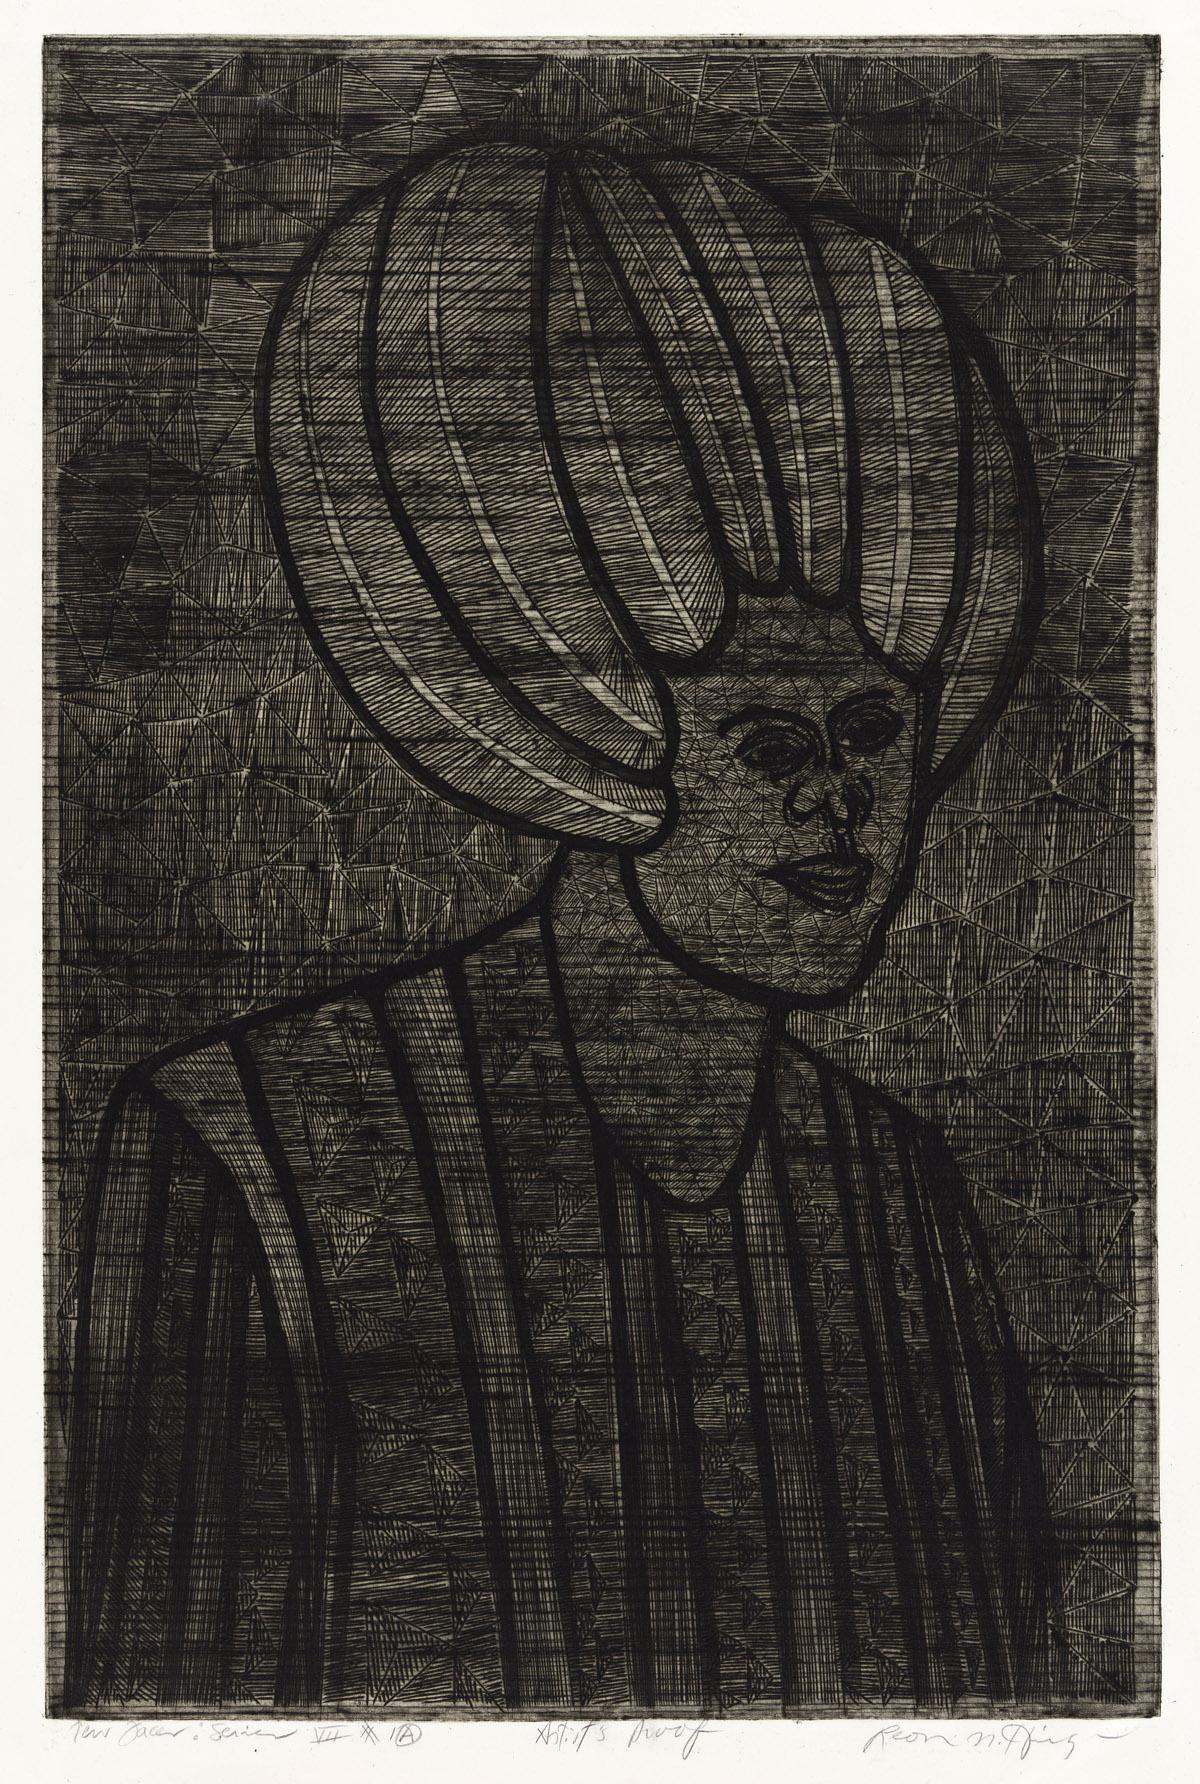 LEON N. HICKS (1933 - ) New Faces: Series VII #1A.